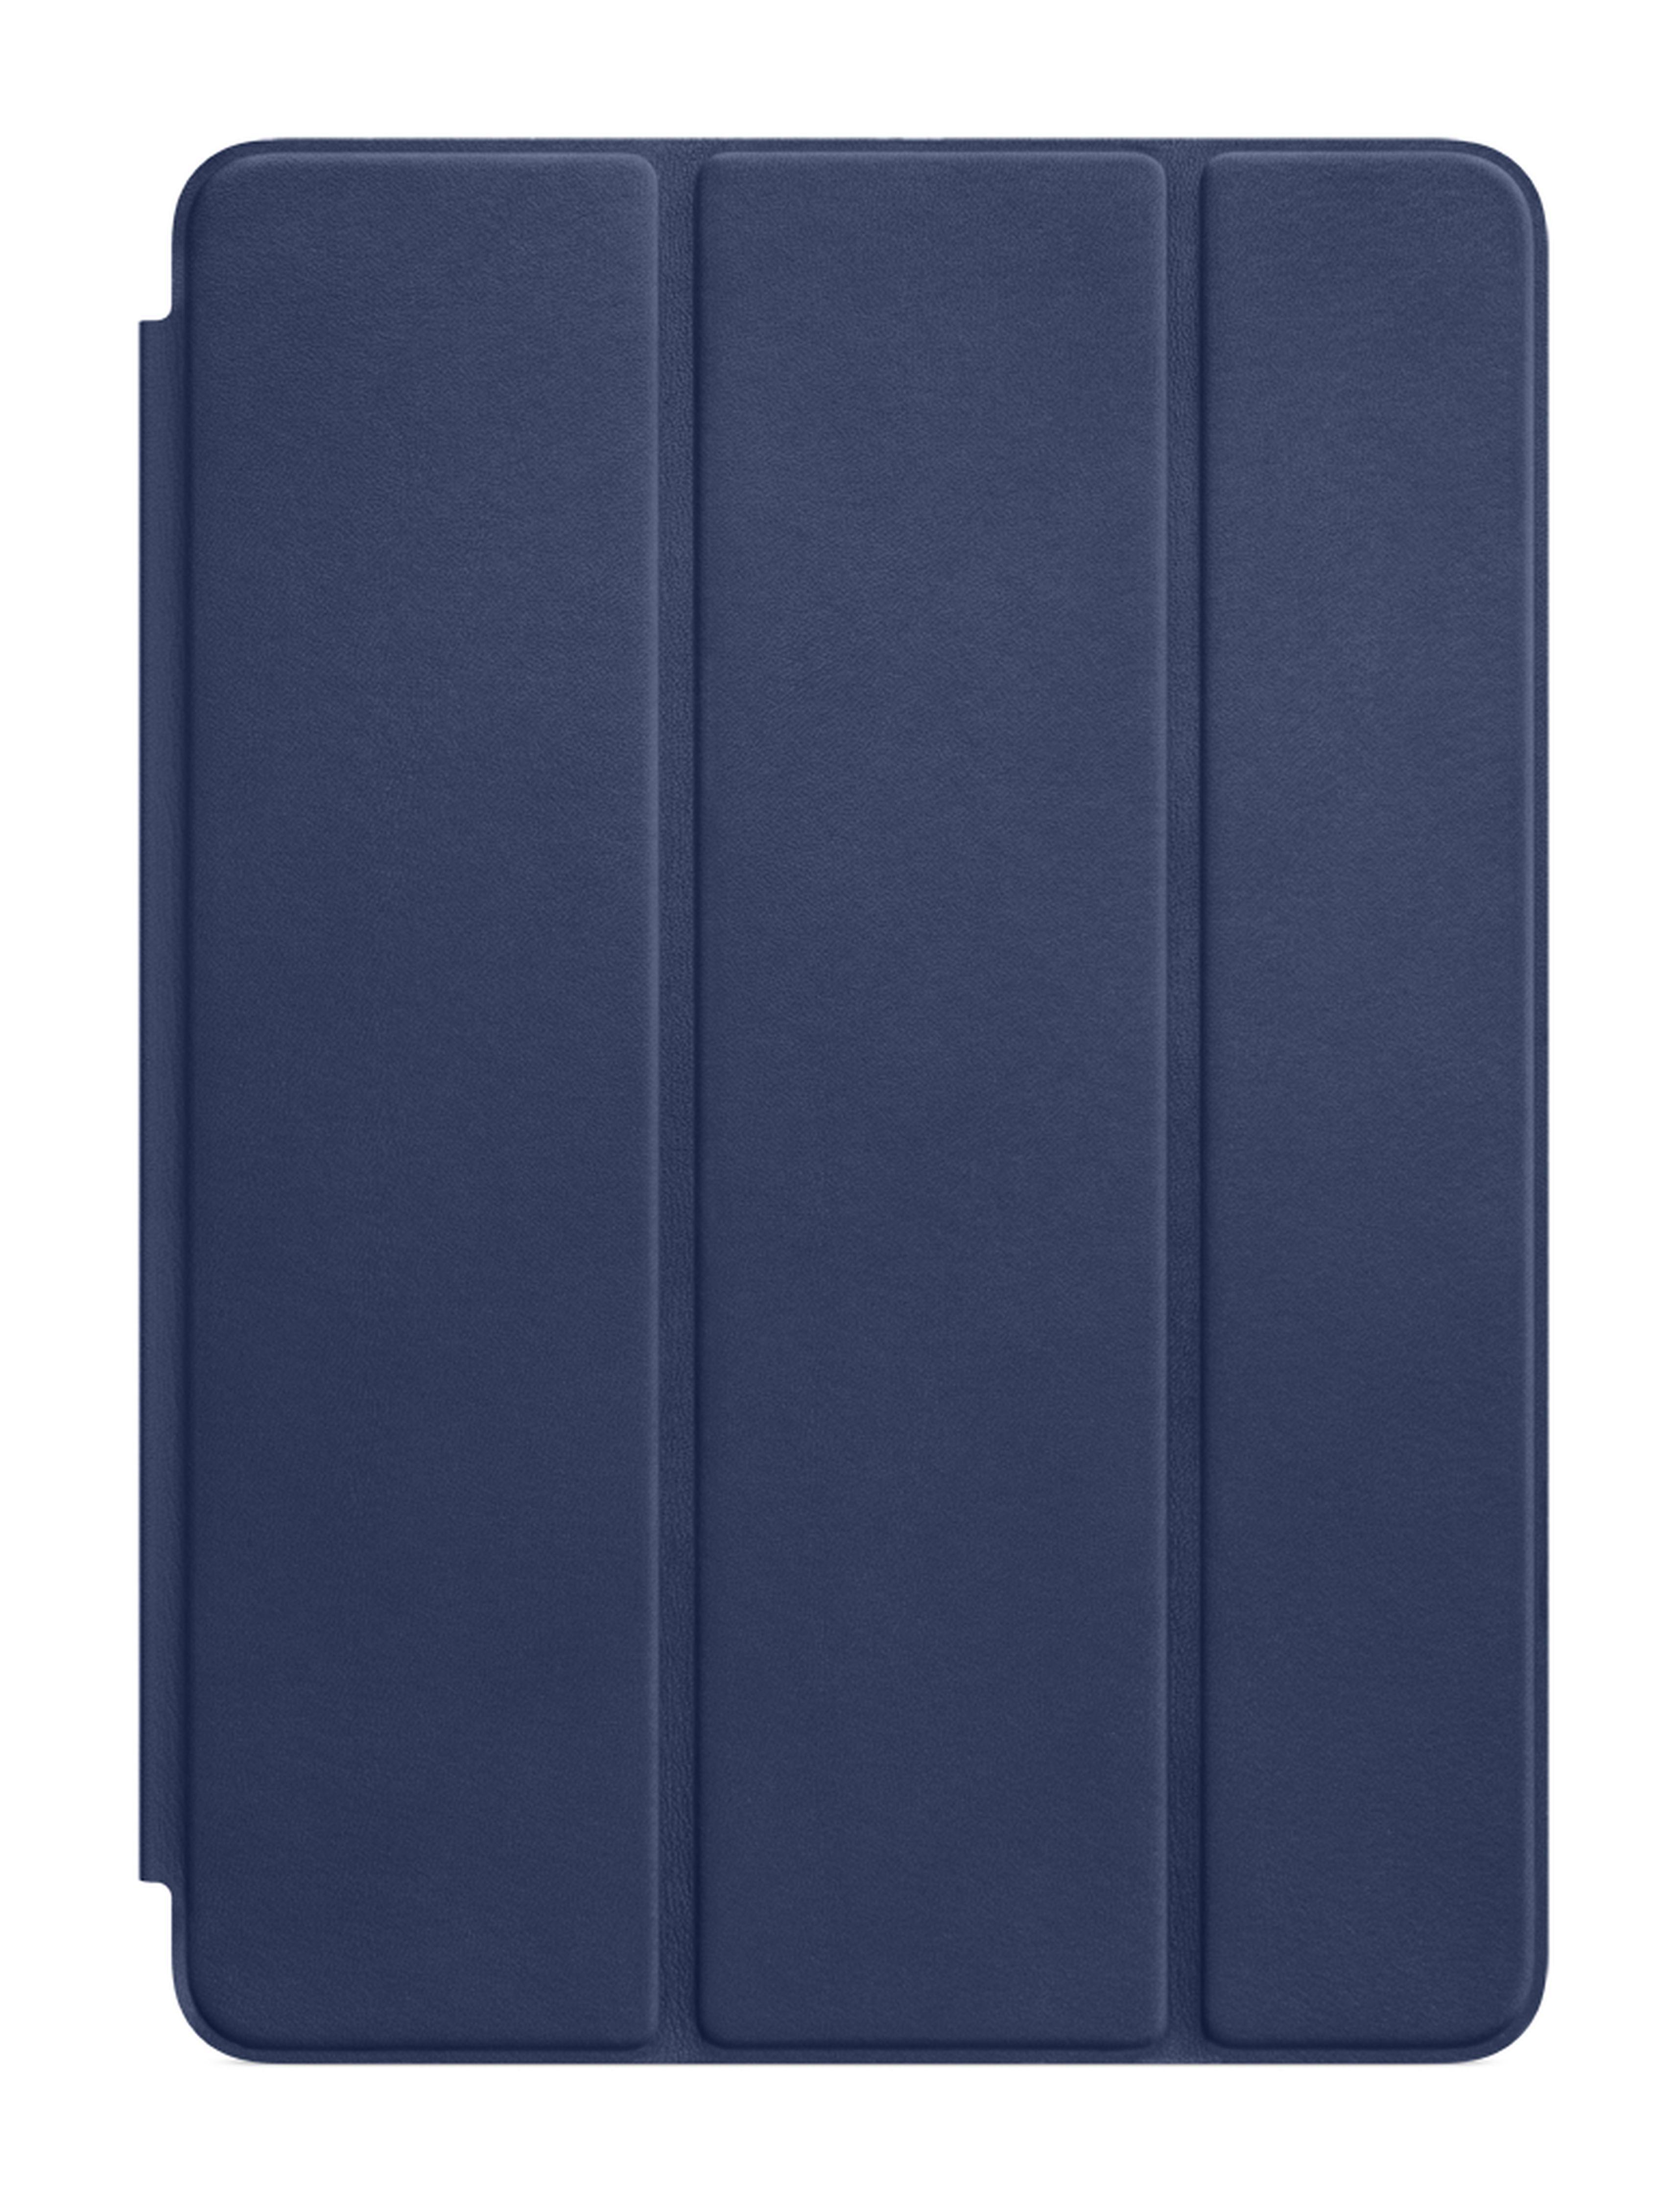 APPLE Schutzhülle »iPad Air 2 Smart Case Blau (MGTR2ZM/A)«